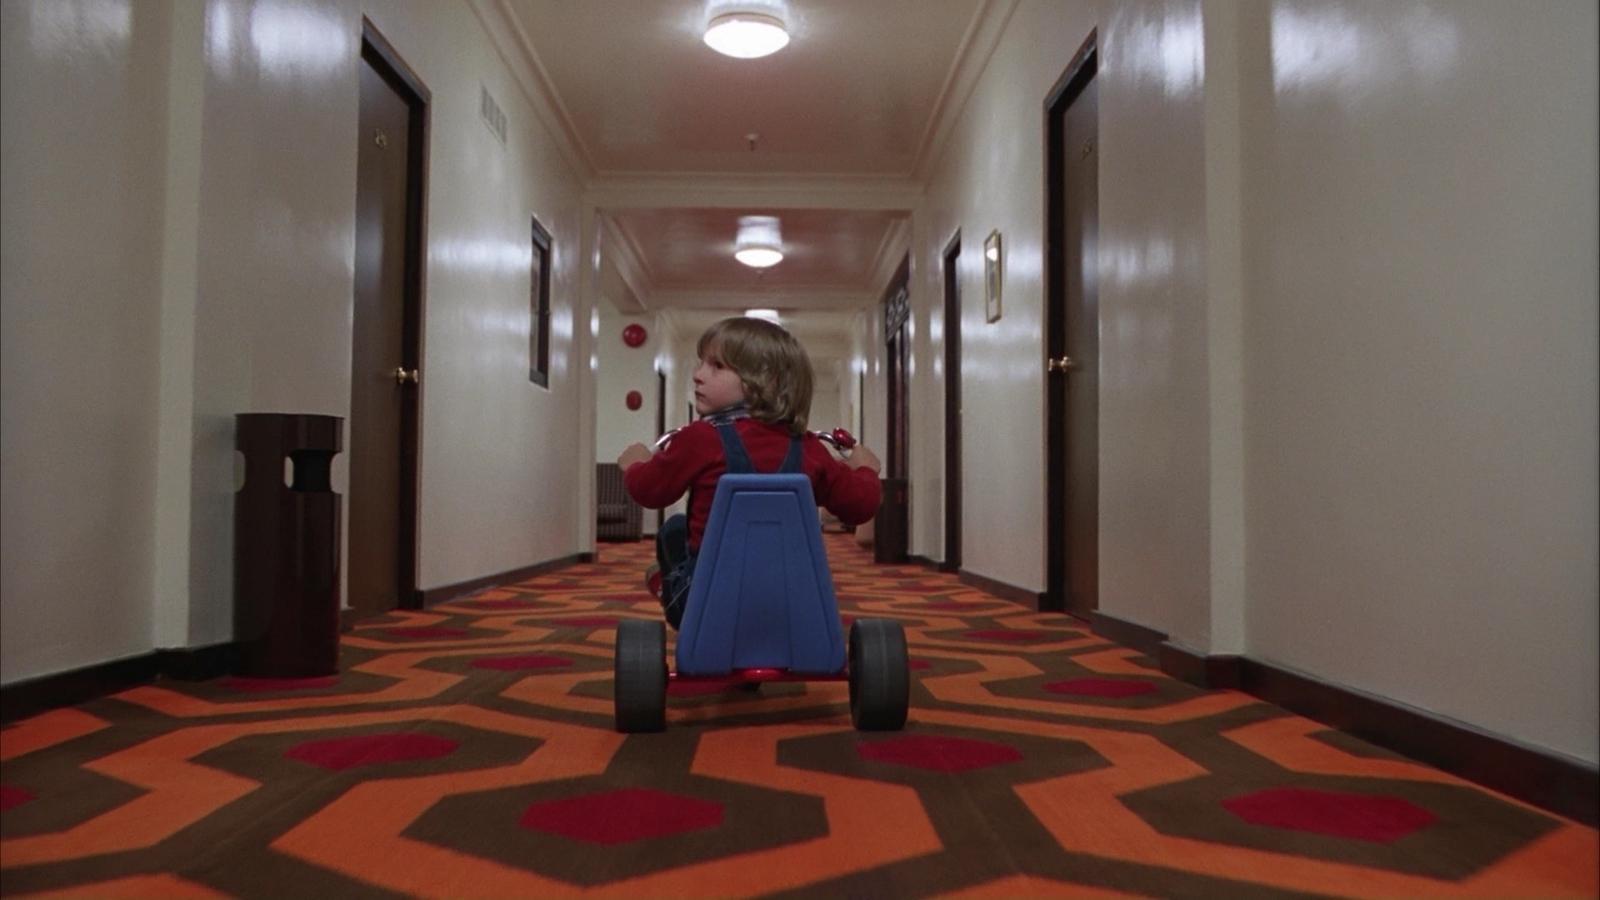 Znalezione obrazy dla zapytania: Overlook The Shining